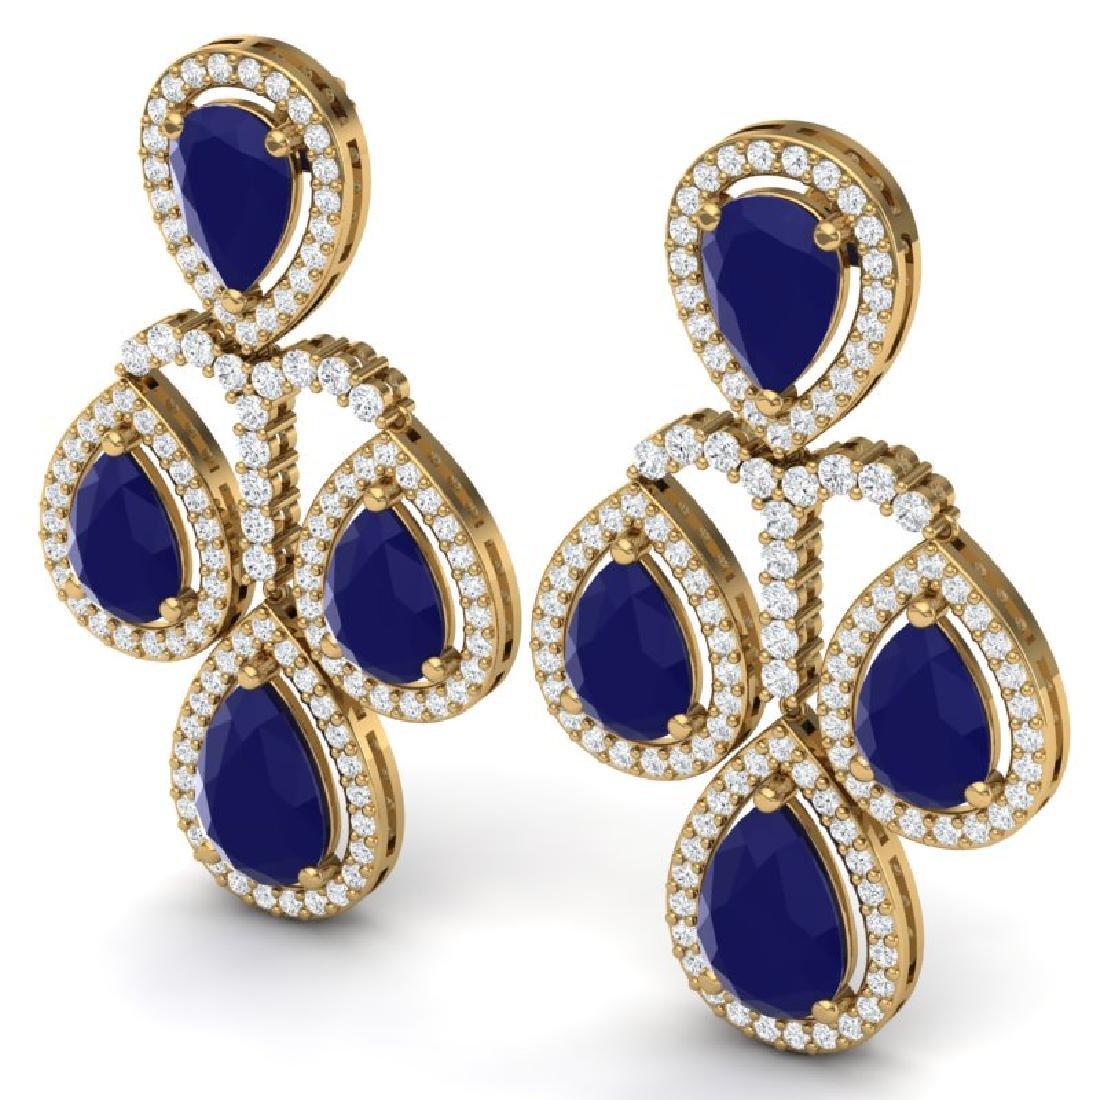 29.23 CTW Royalty Sapphire & VS Diamond Earrings 18K - 2